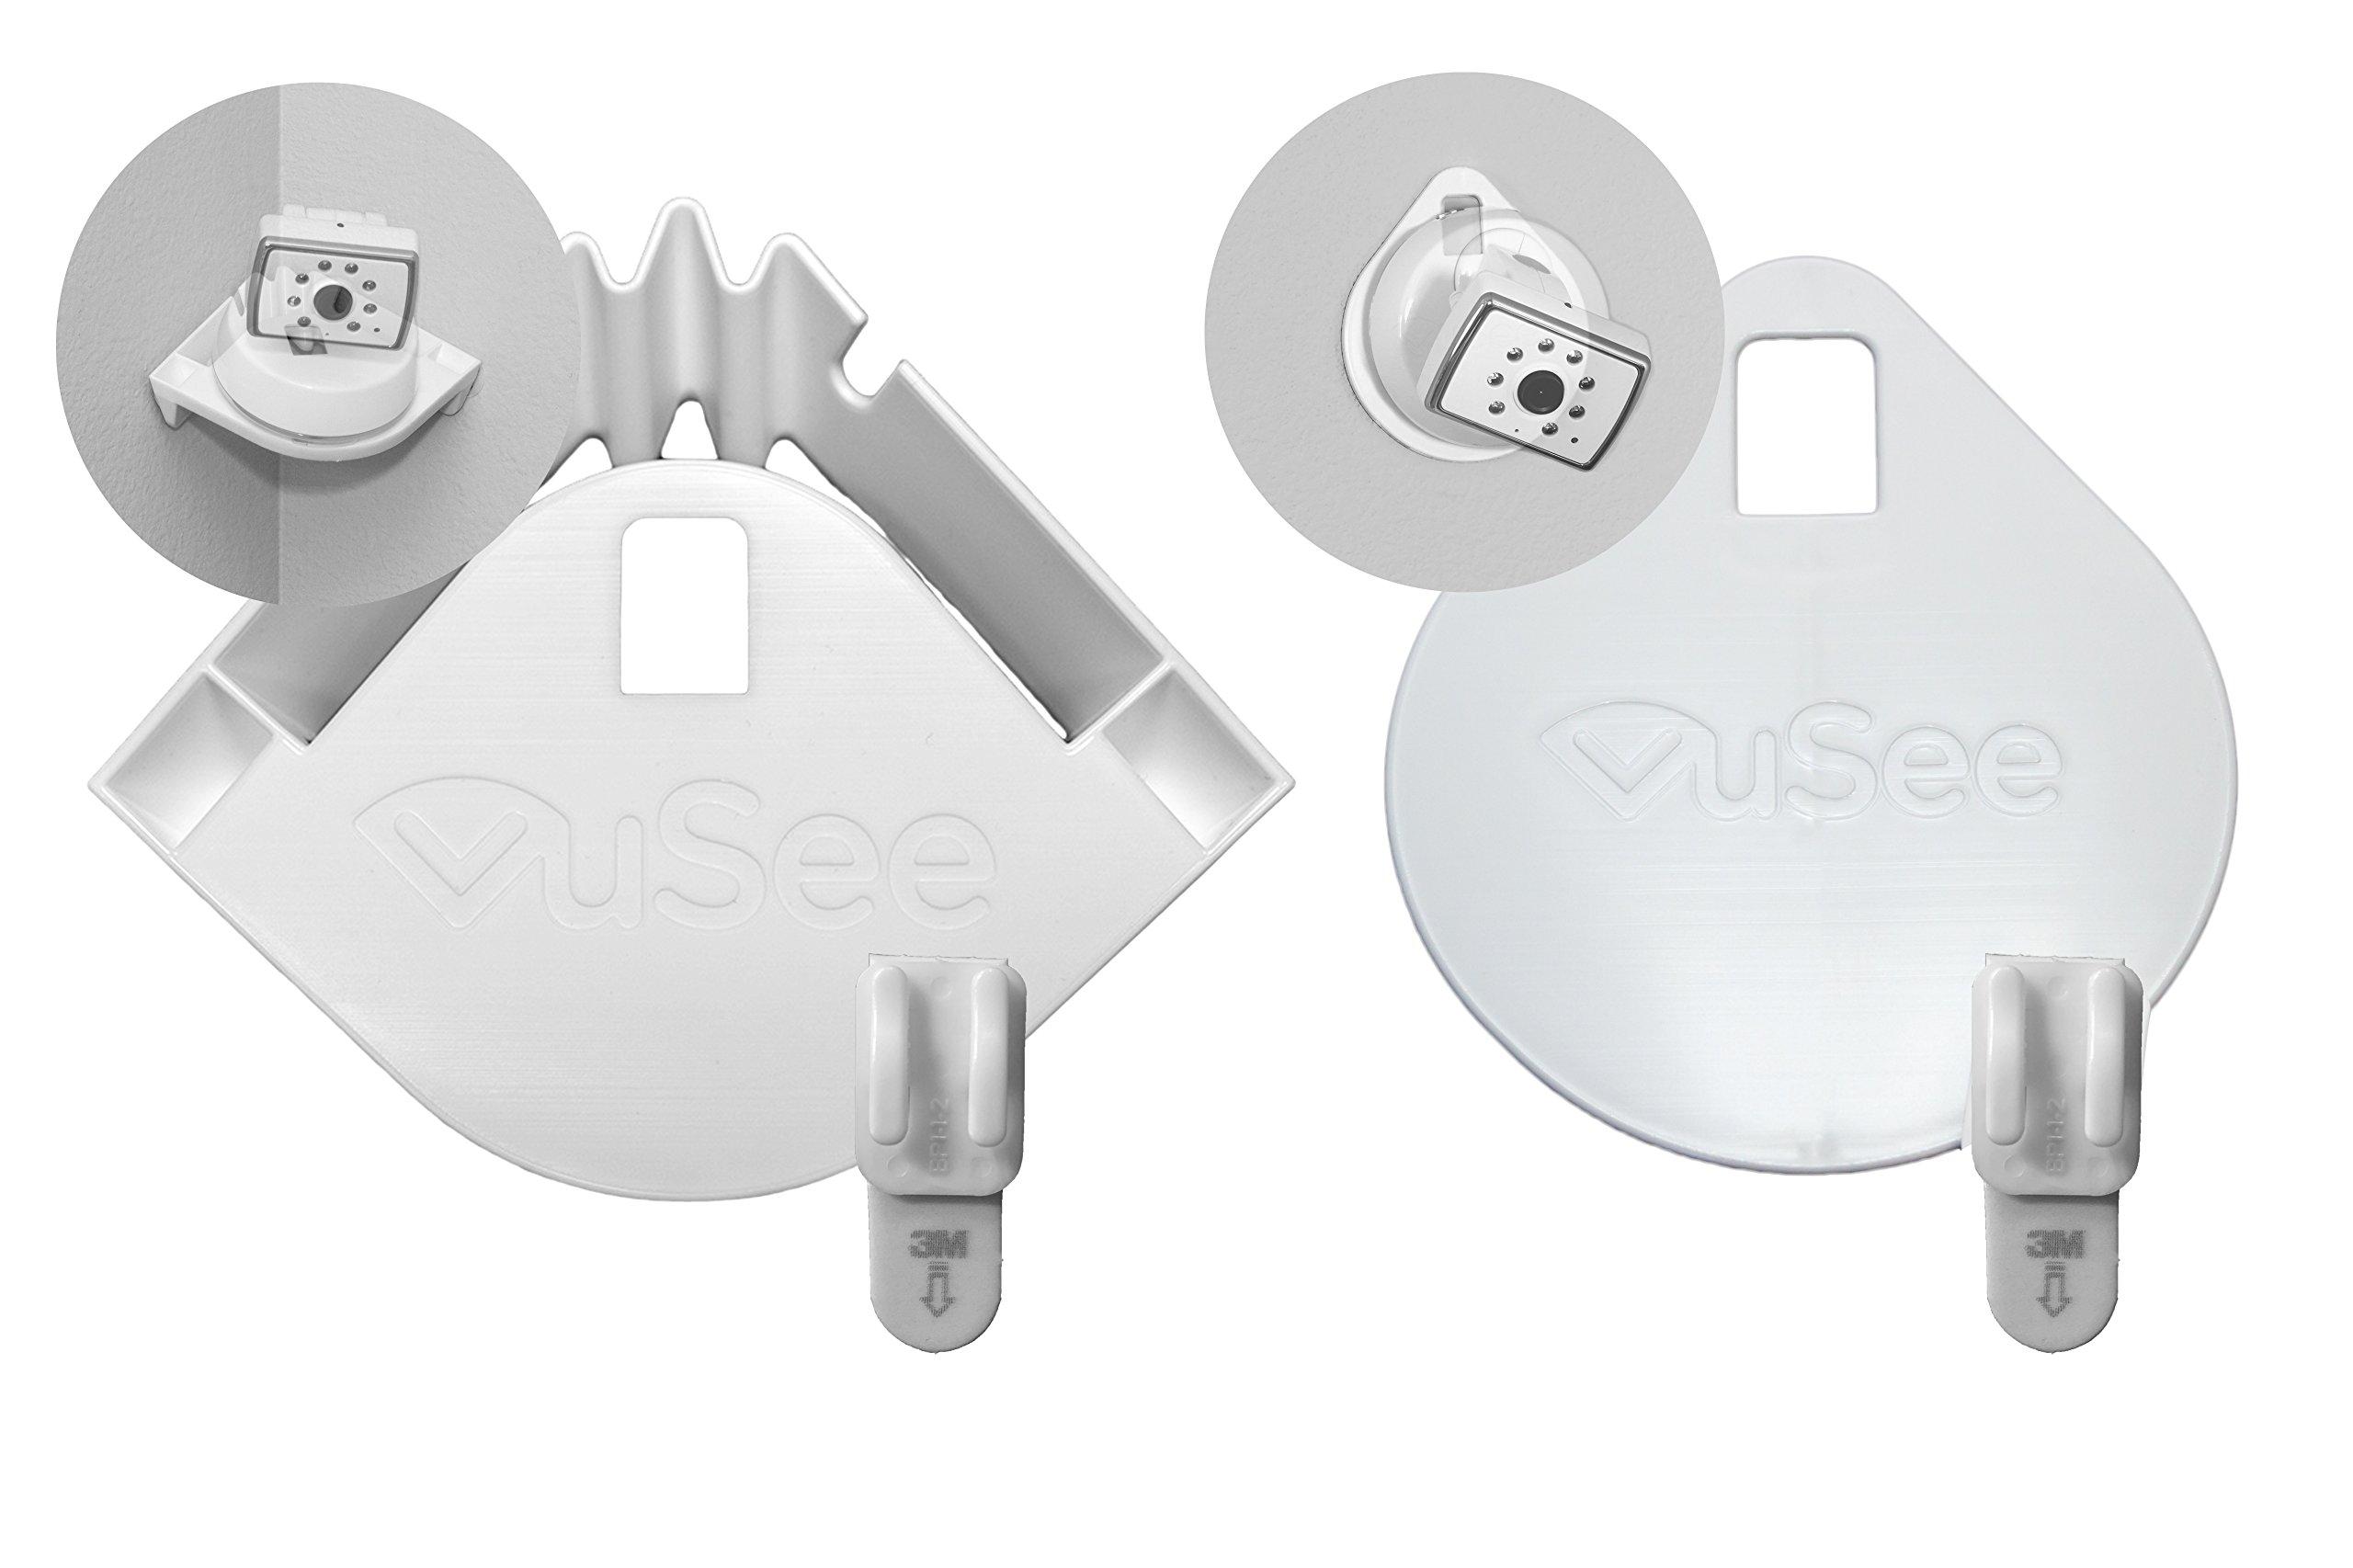 VuSee - The Universal Baby Monitor Shelf (Bundle)